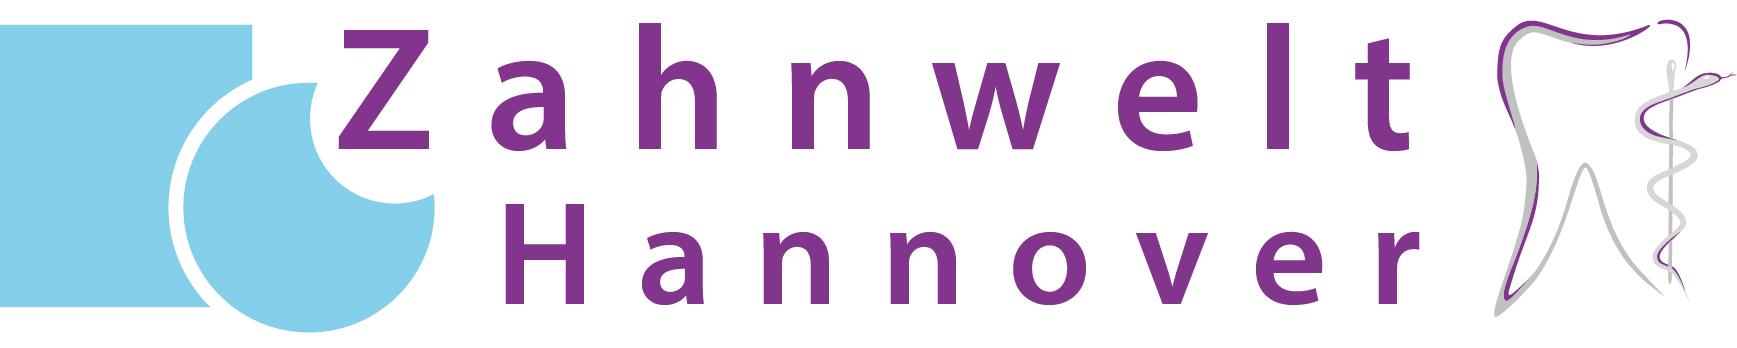 Digitaler Workflow | Zahnwelt Hannover